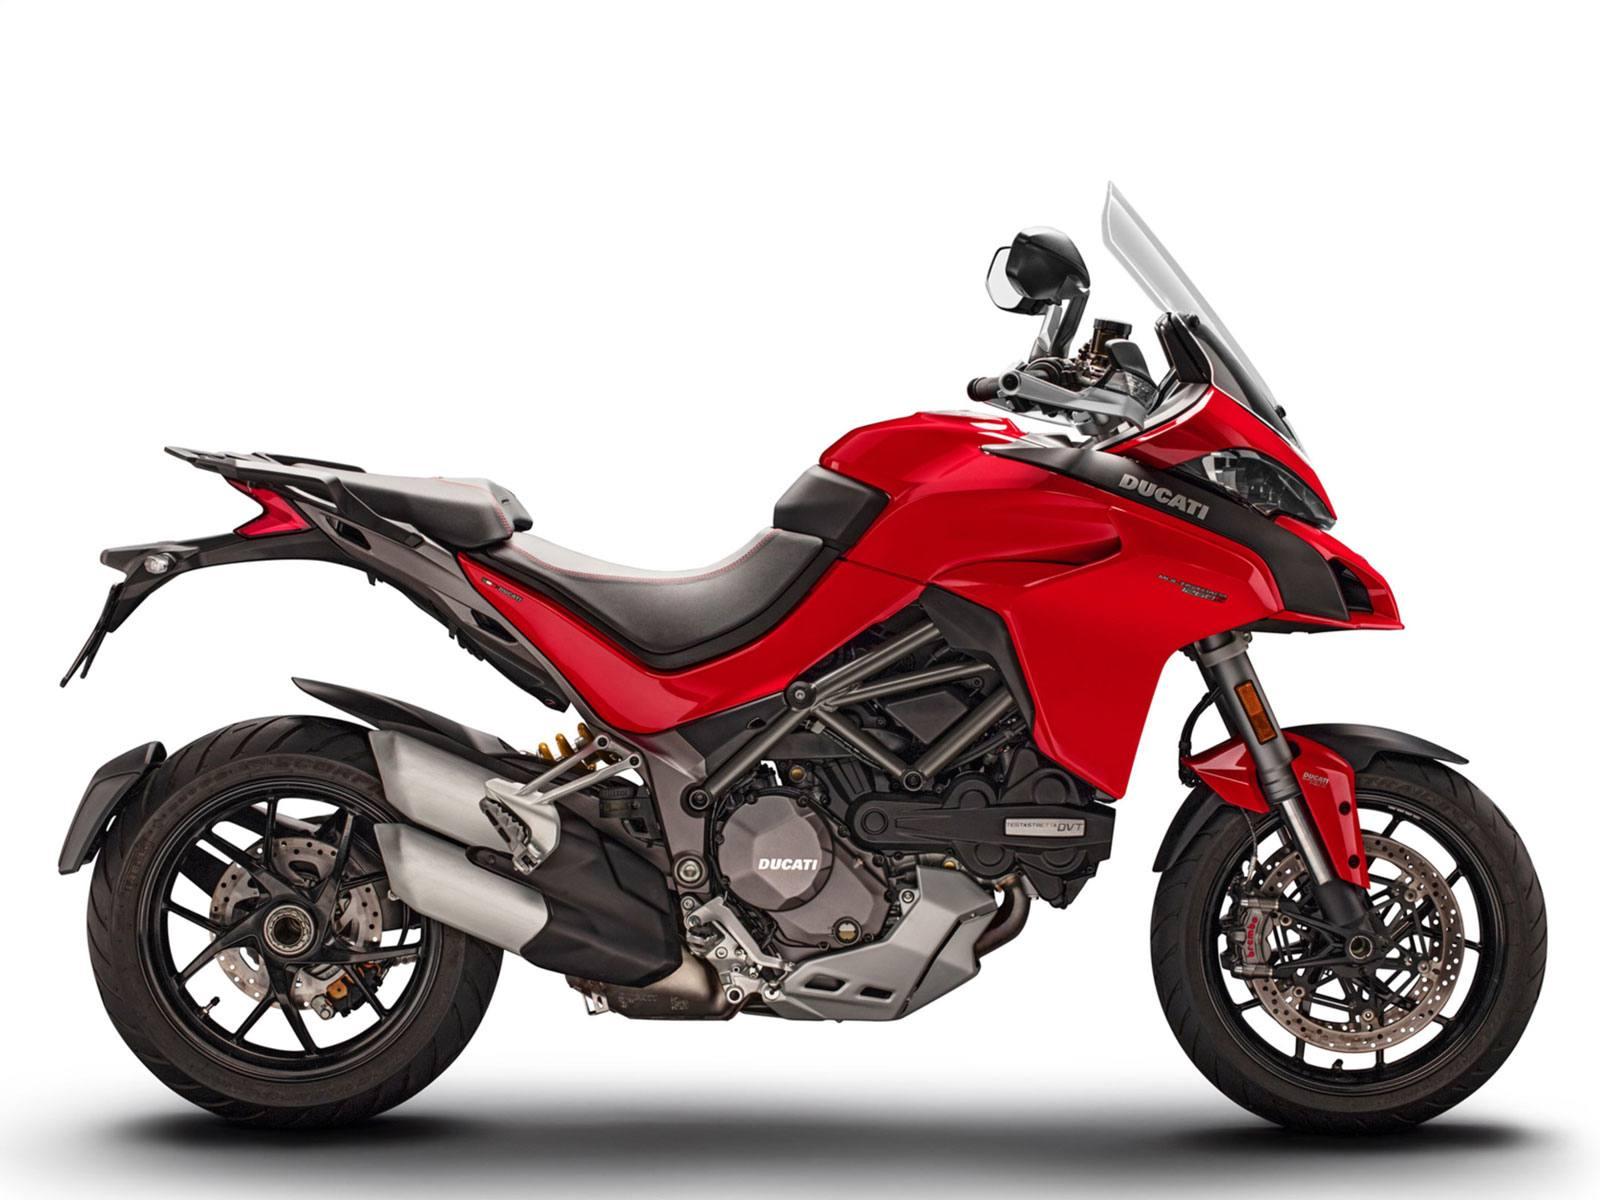 Мотоцикл DUCATI Multistrada 1260 S - Ducati Red (2019)